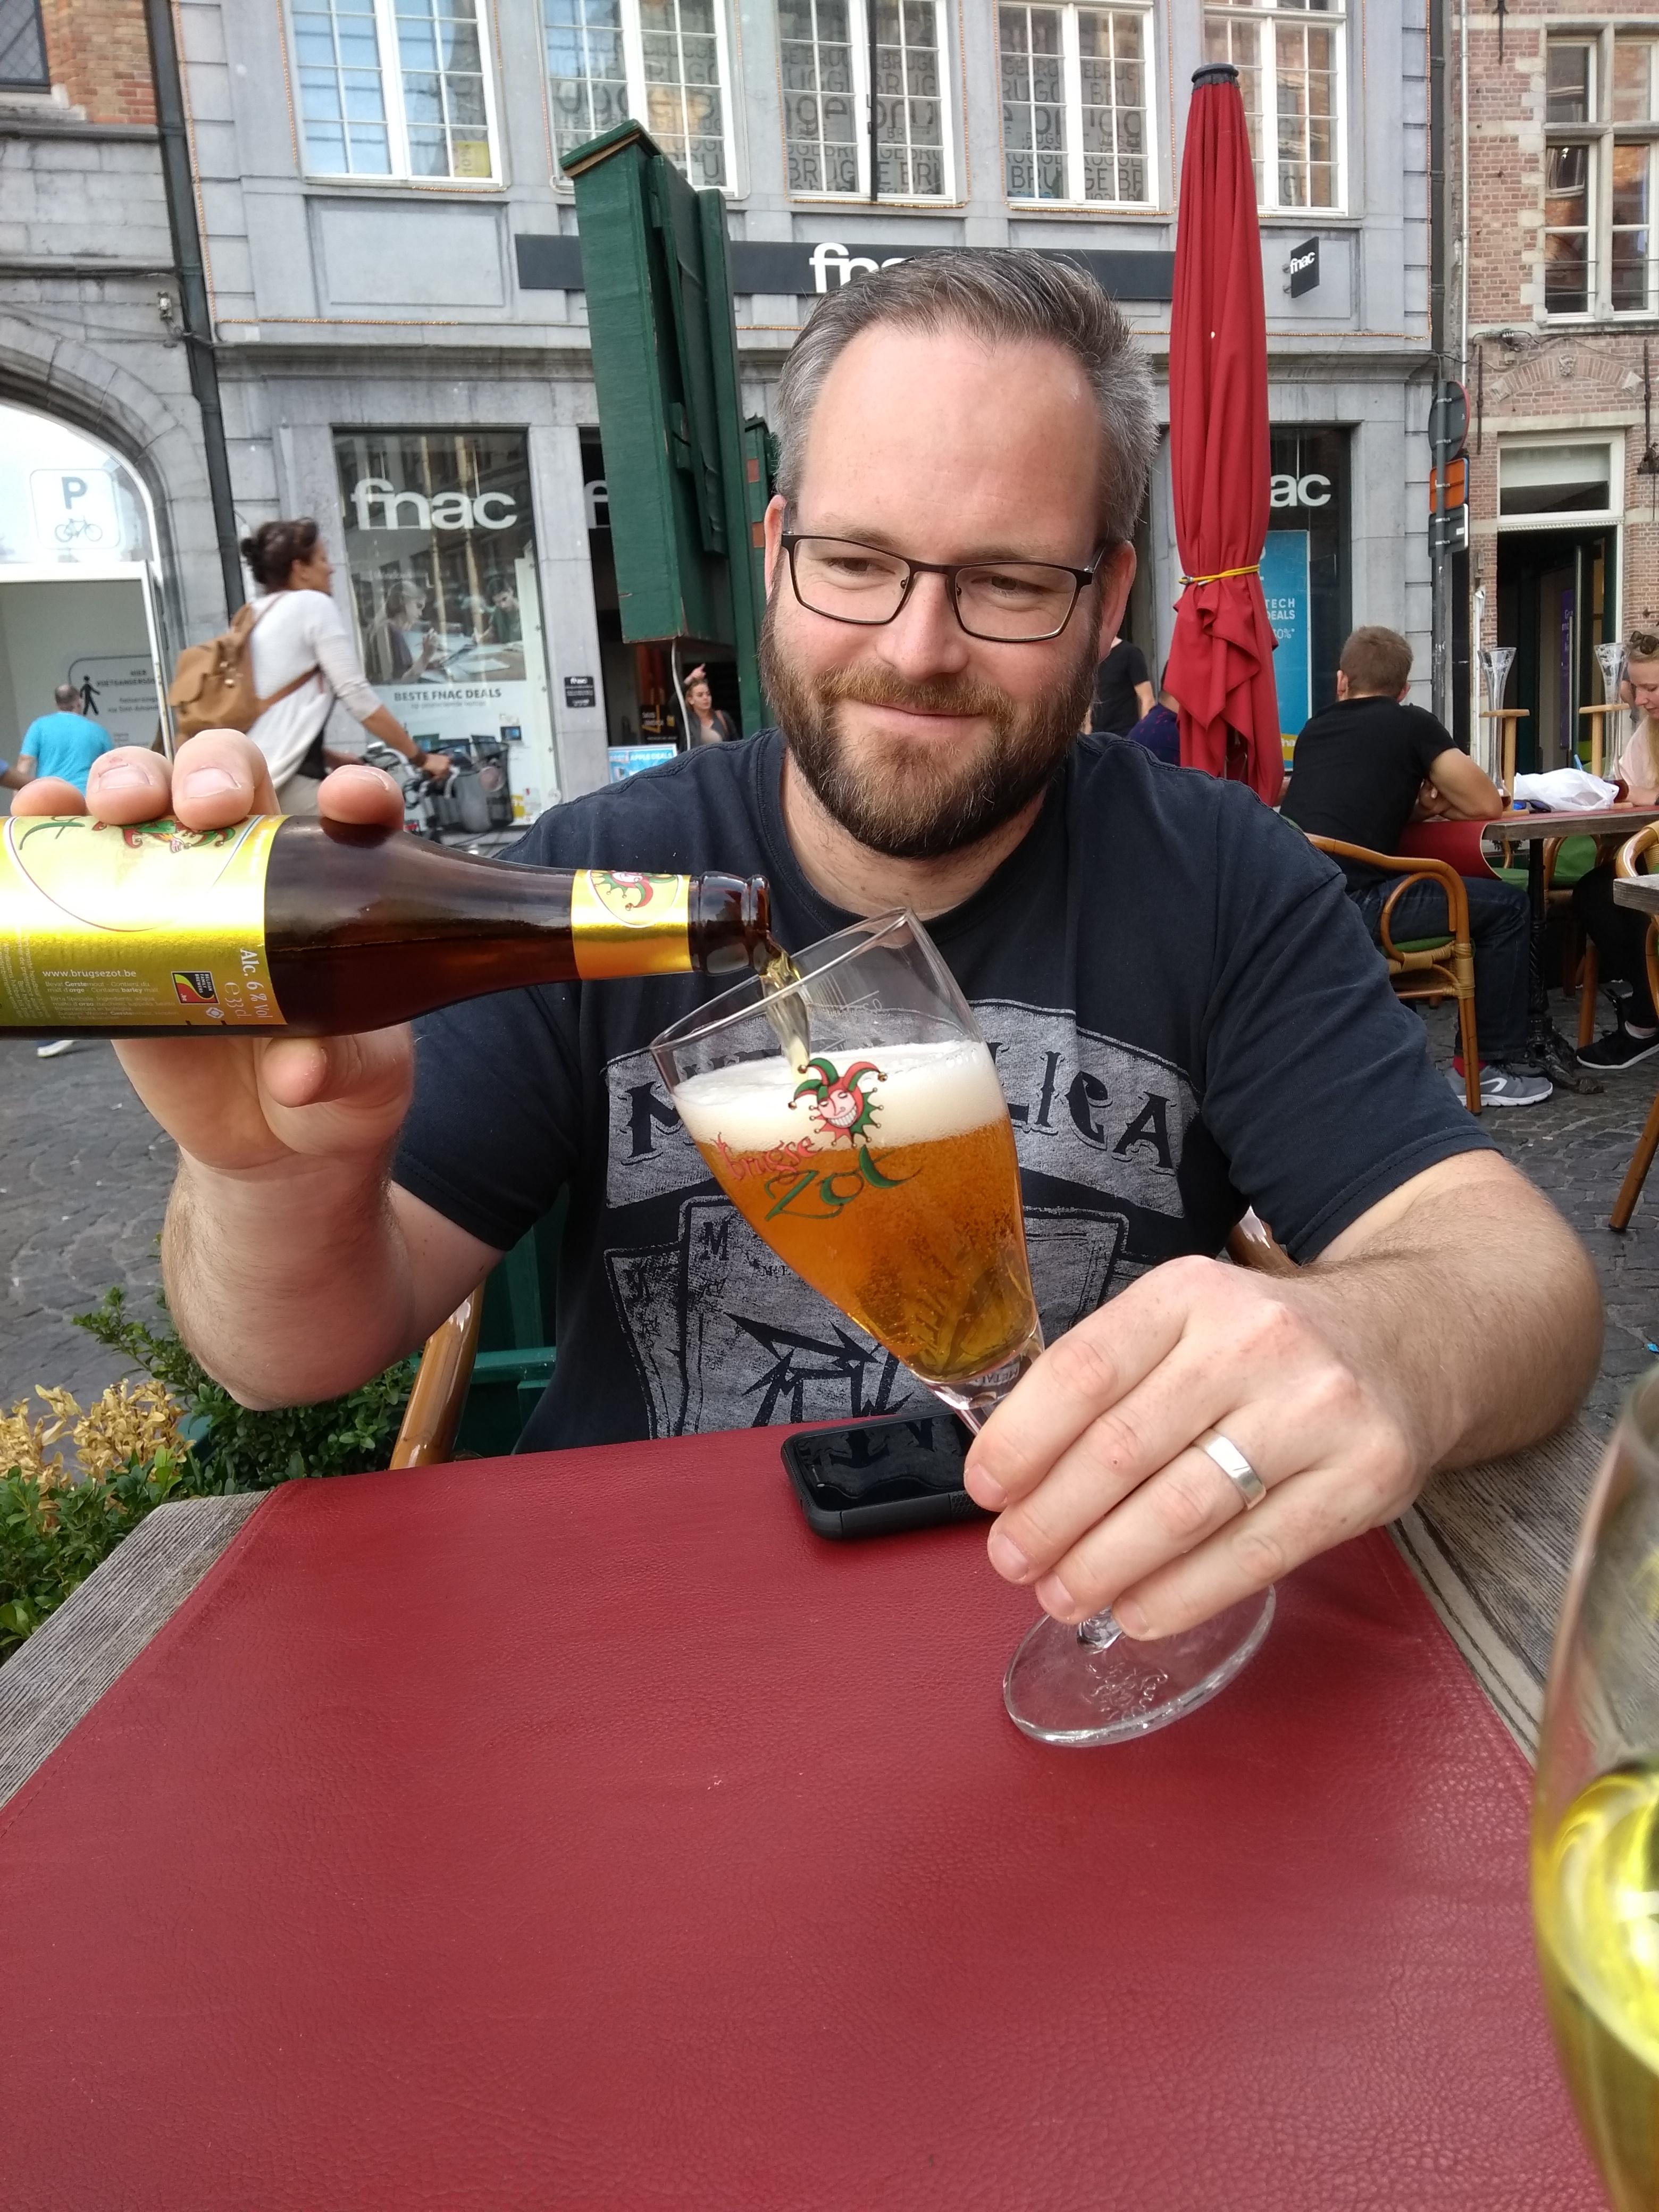 brugge, weekend, weekendje weg, overnachting, Ibis, hotel, plog Brugge, Belgie, blogger, mamablog, op reis, mamablogger, lalog.nl, lalogblog, lalog